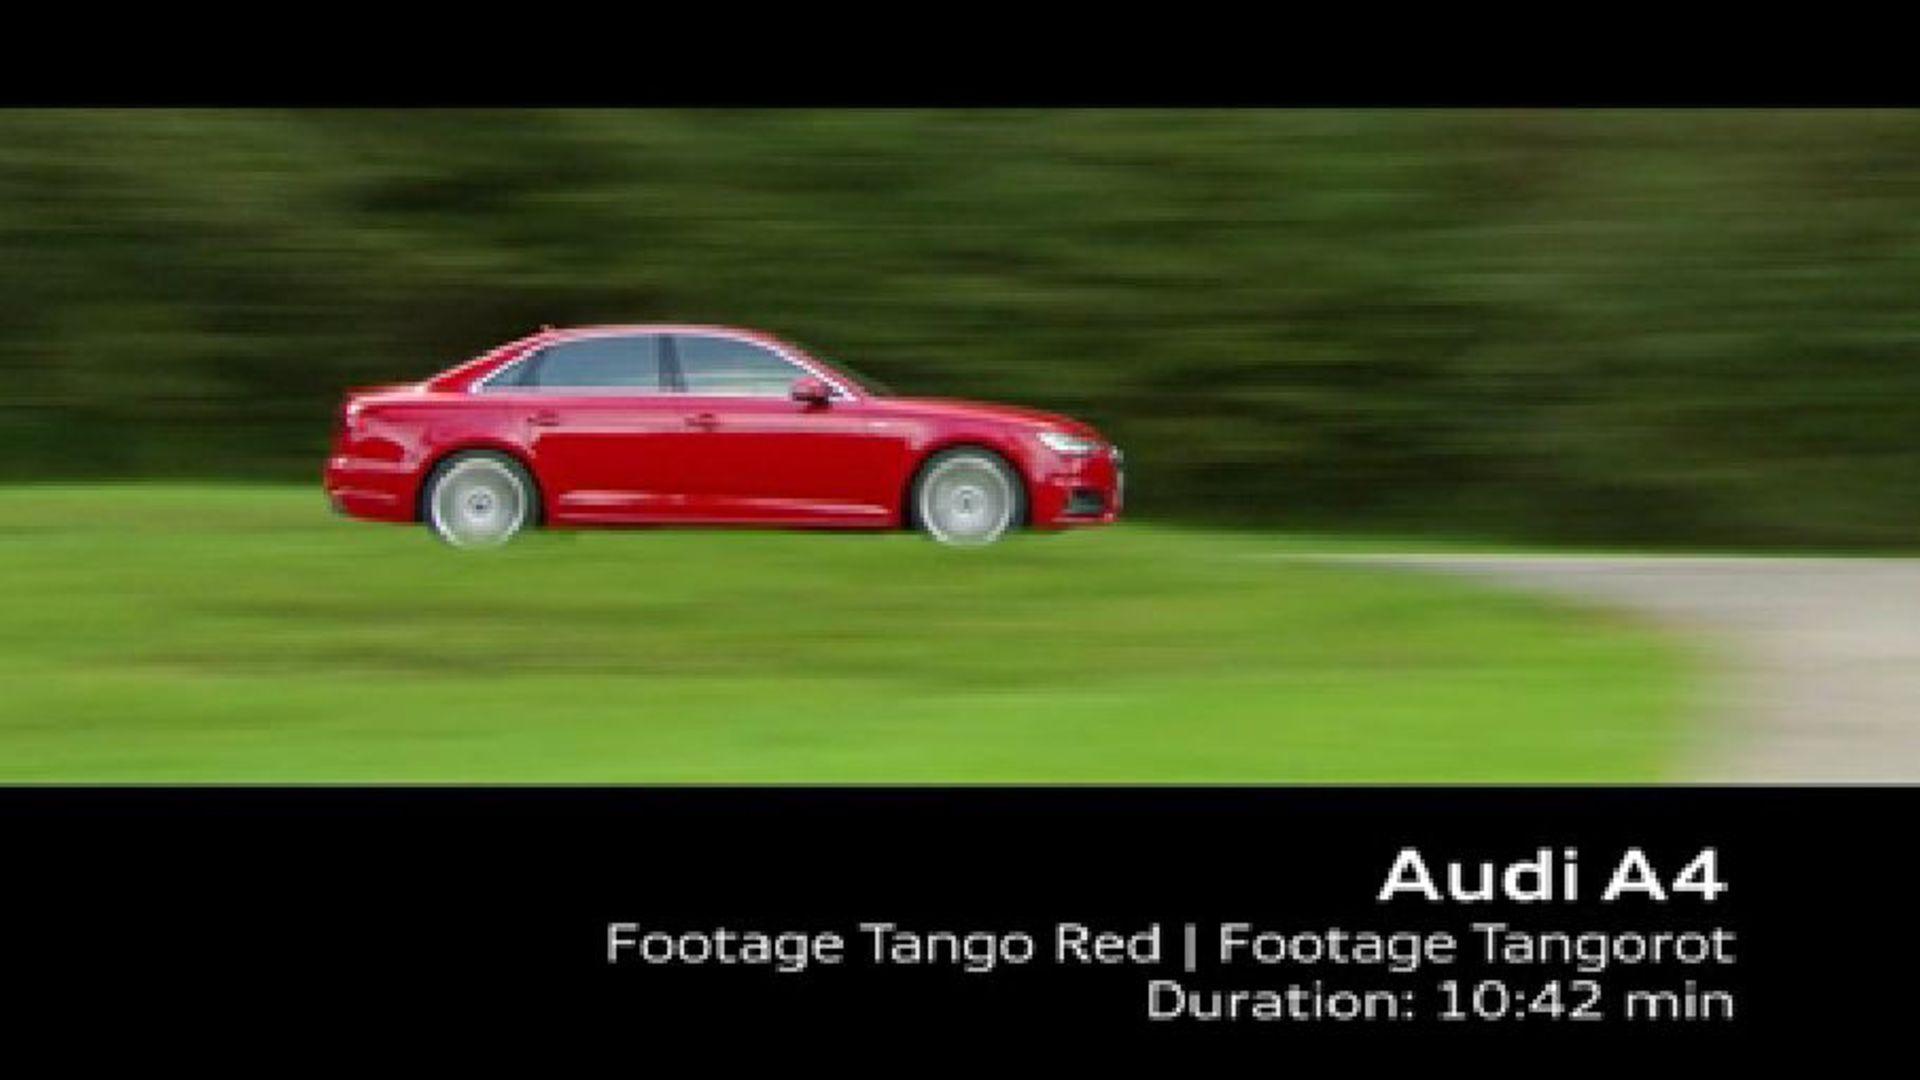 Audi A4 Sedan (2015) - Footage Tango Red